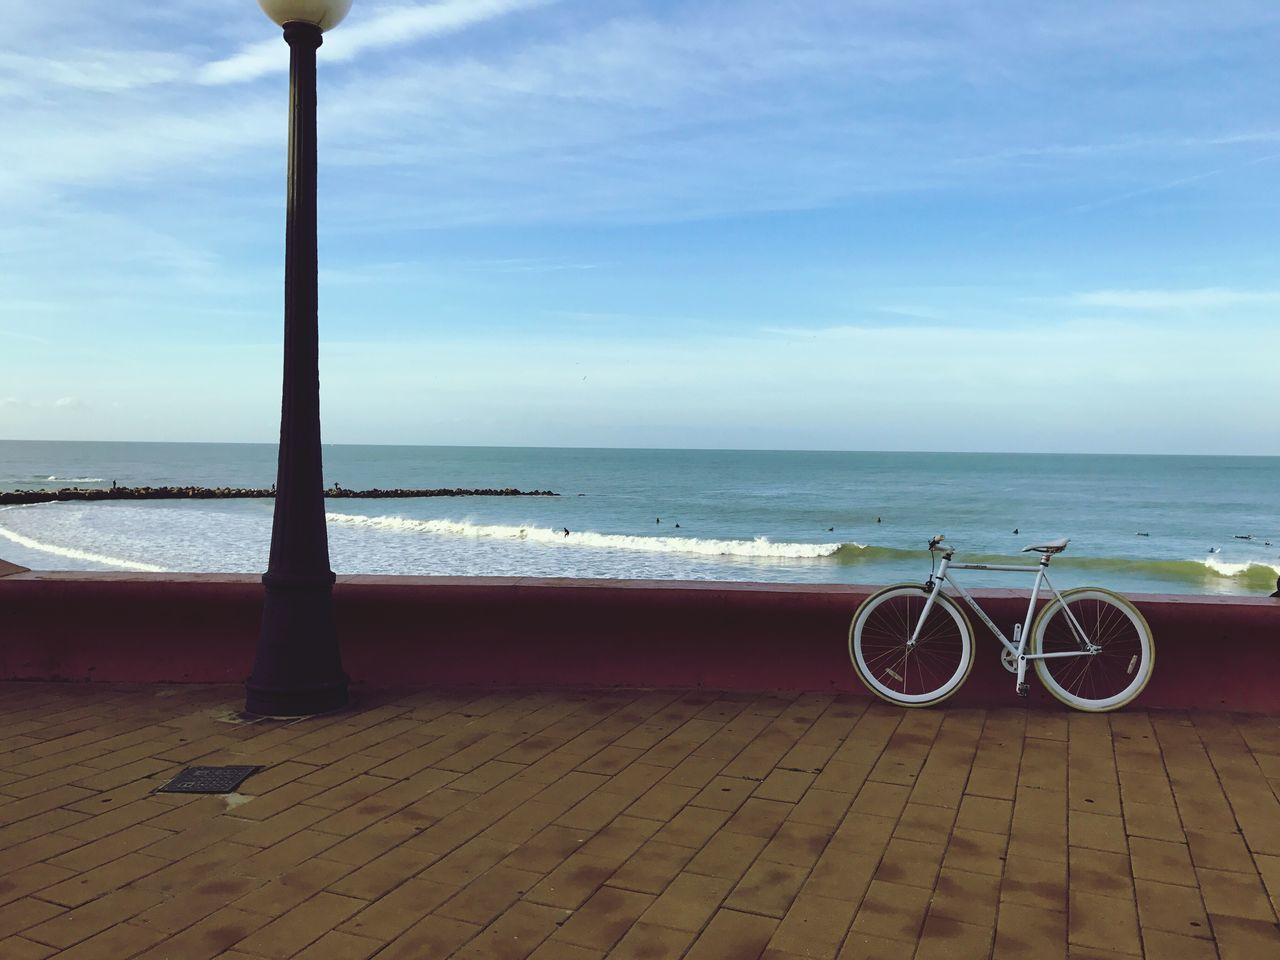 12daysofeyeem Cádiz, Spain Hdr_Collection EyeEm Best Shots Urban Exploration Travel Photography